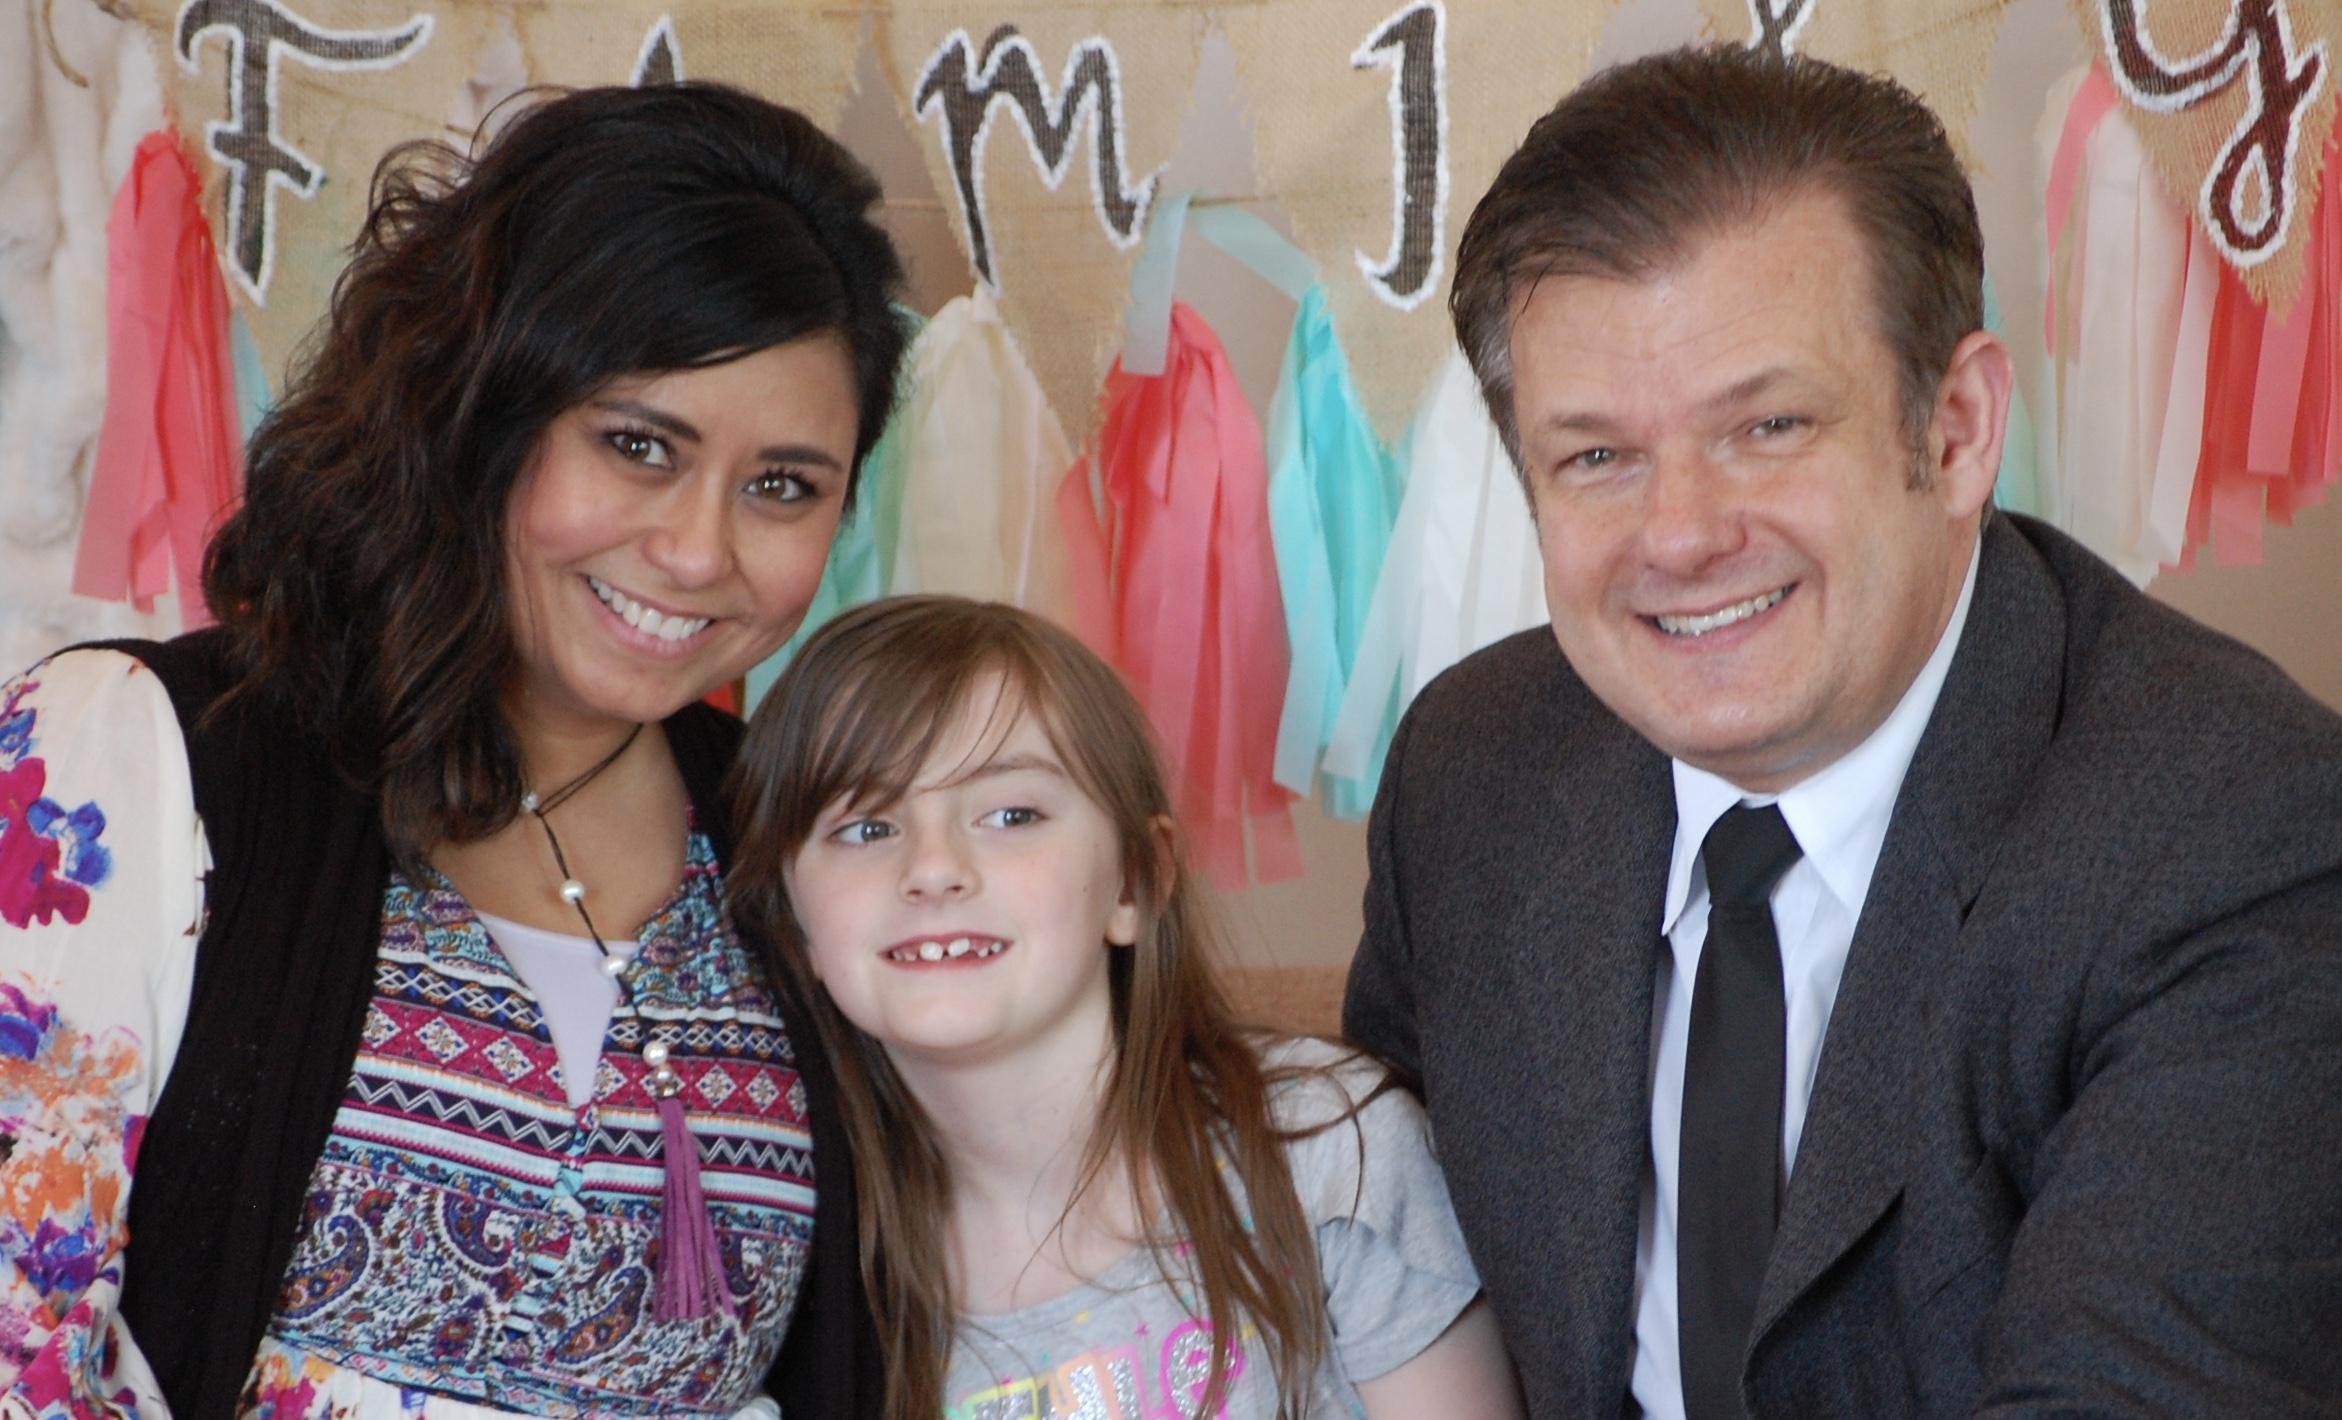 Pastors Keith and Margie Nix, daughter, Isabella Faith